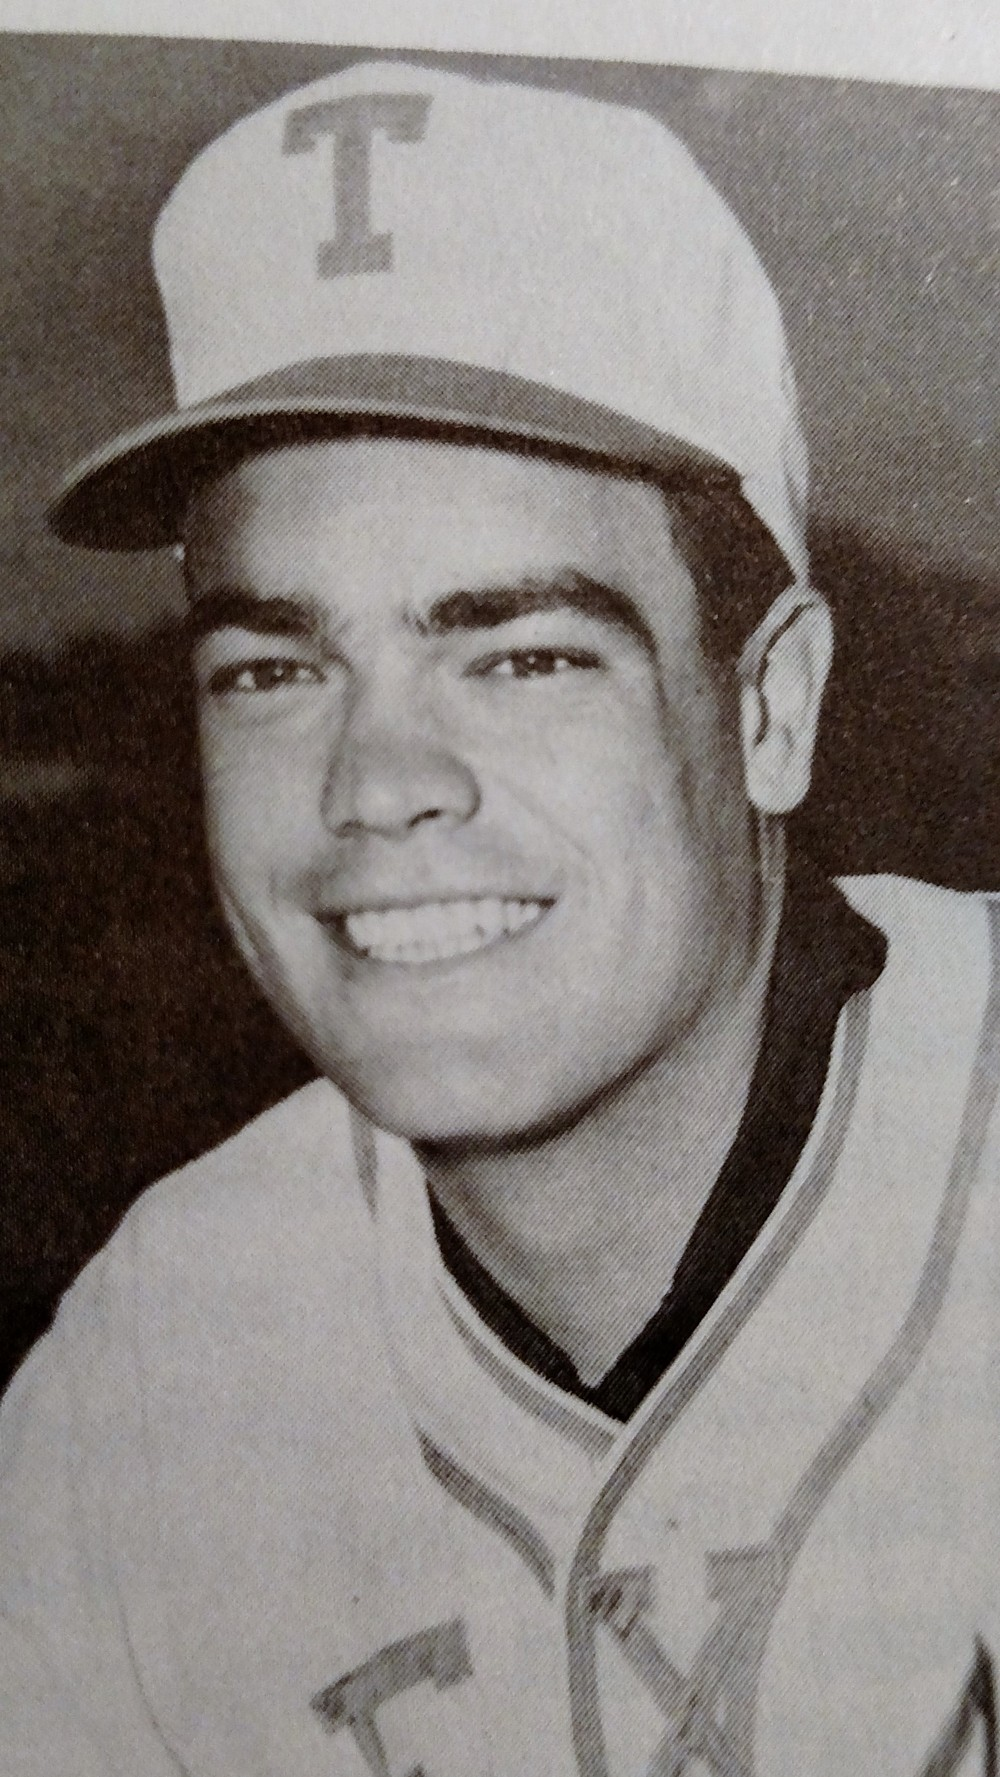 Bob Snoddy 1967 batting champ